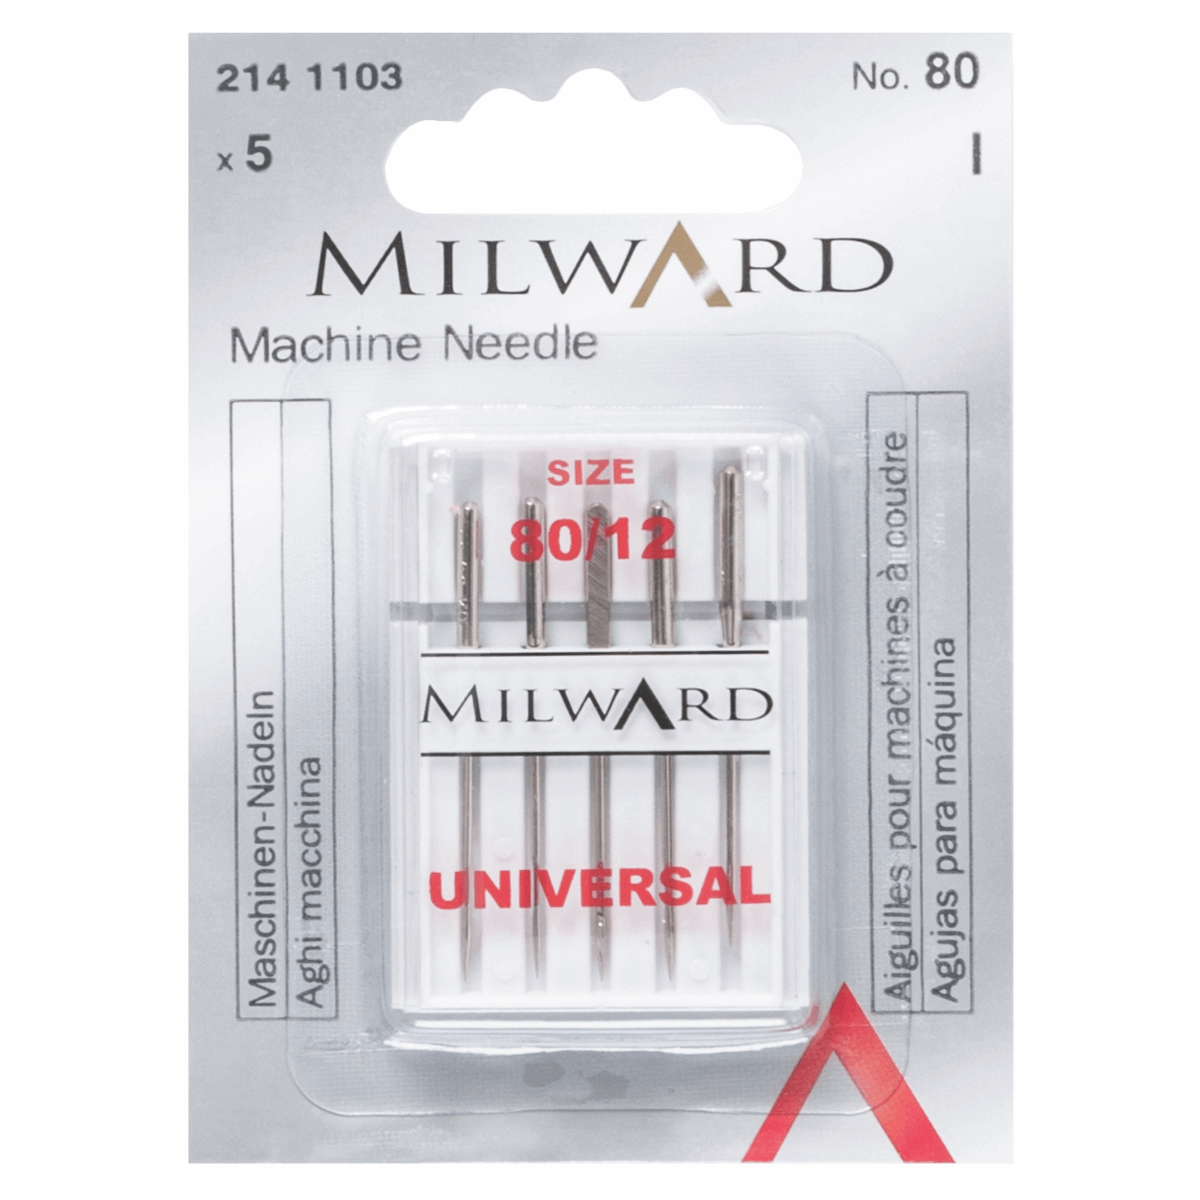 Milward Universal Sewing Machine Needles